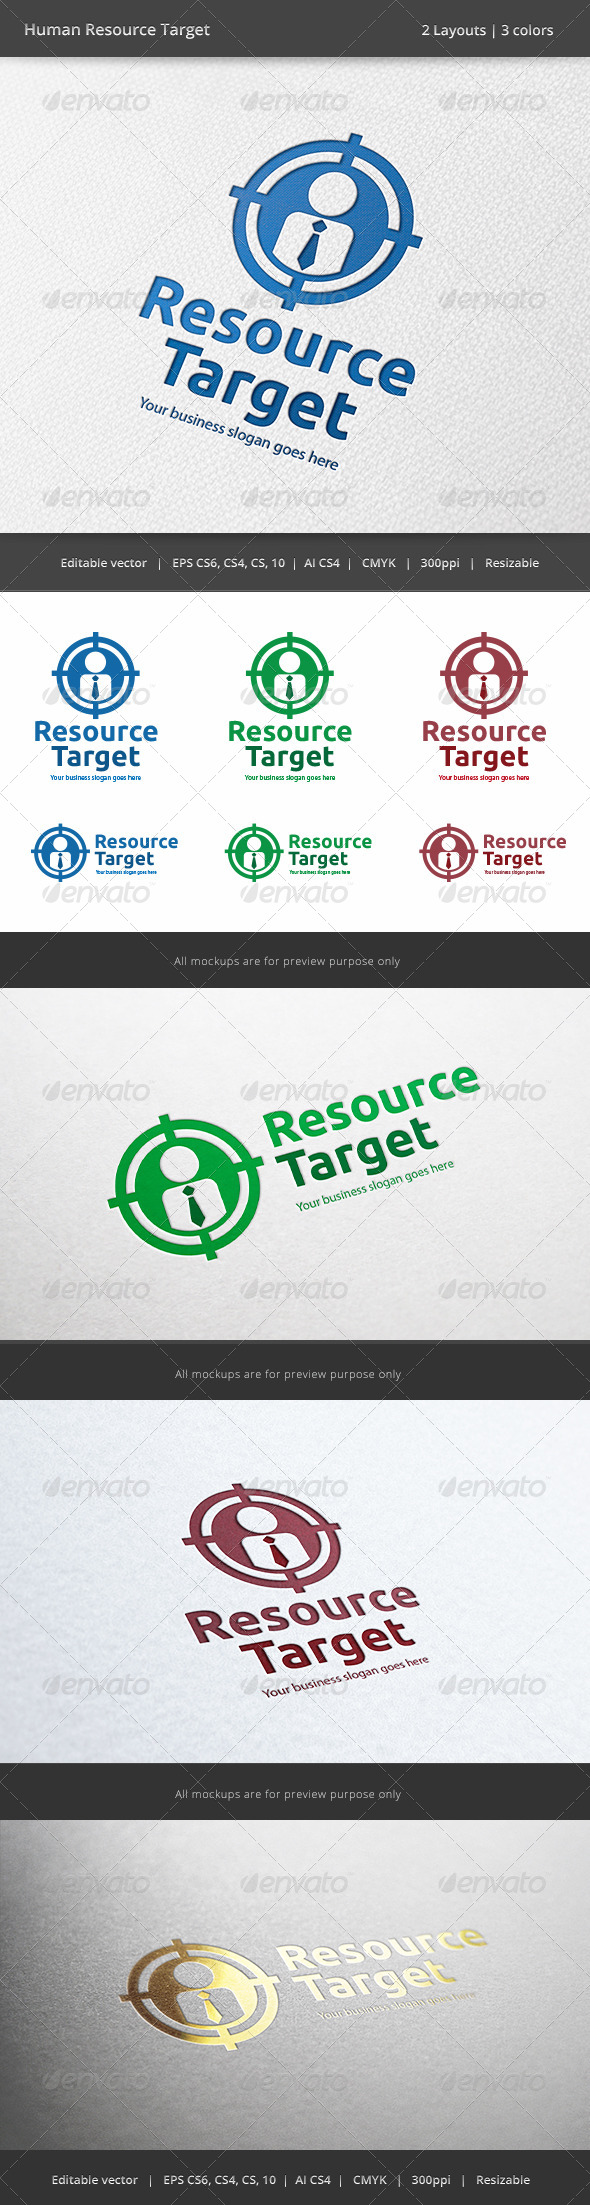 GraphicRiver Human Resource Target Logo 6261566